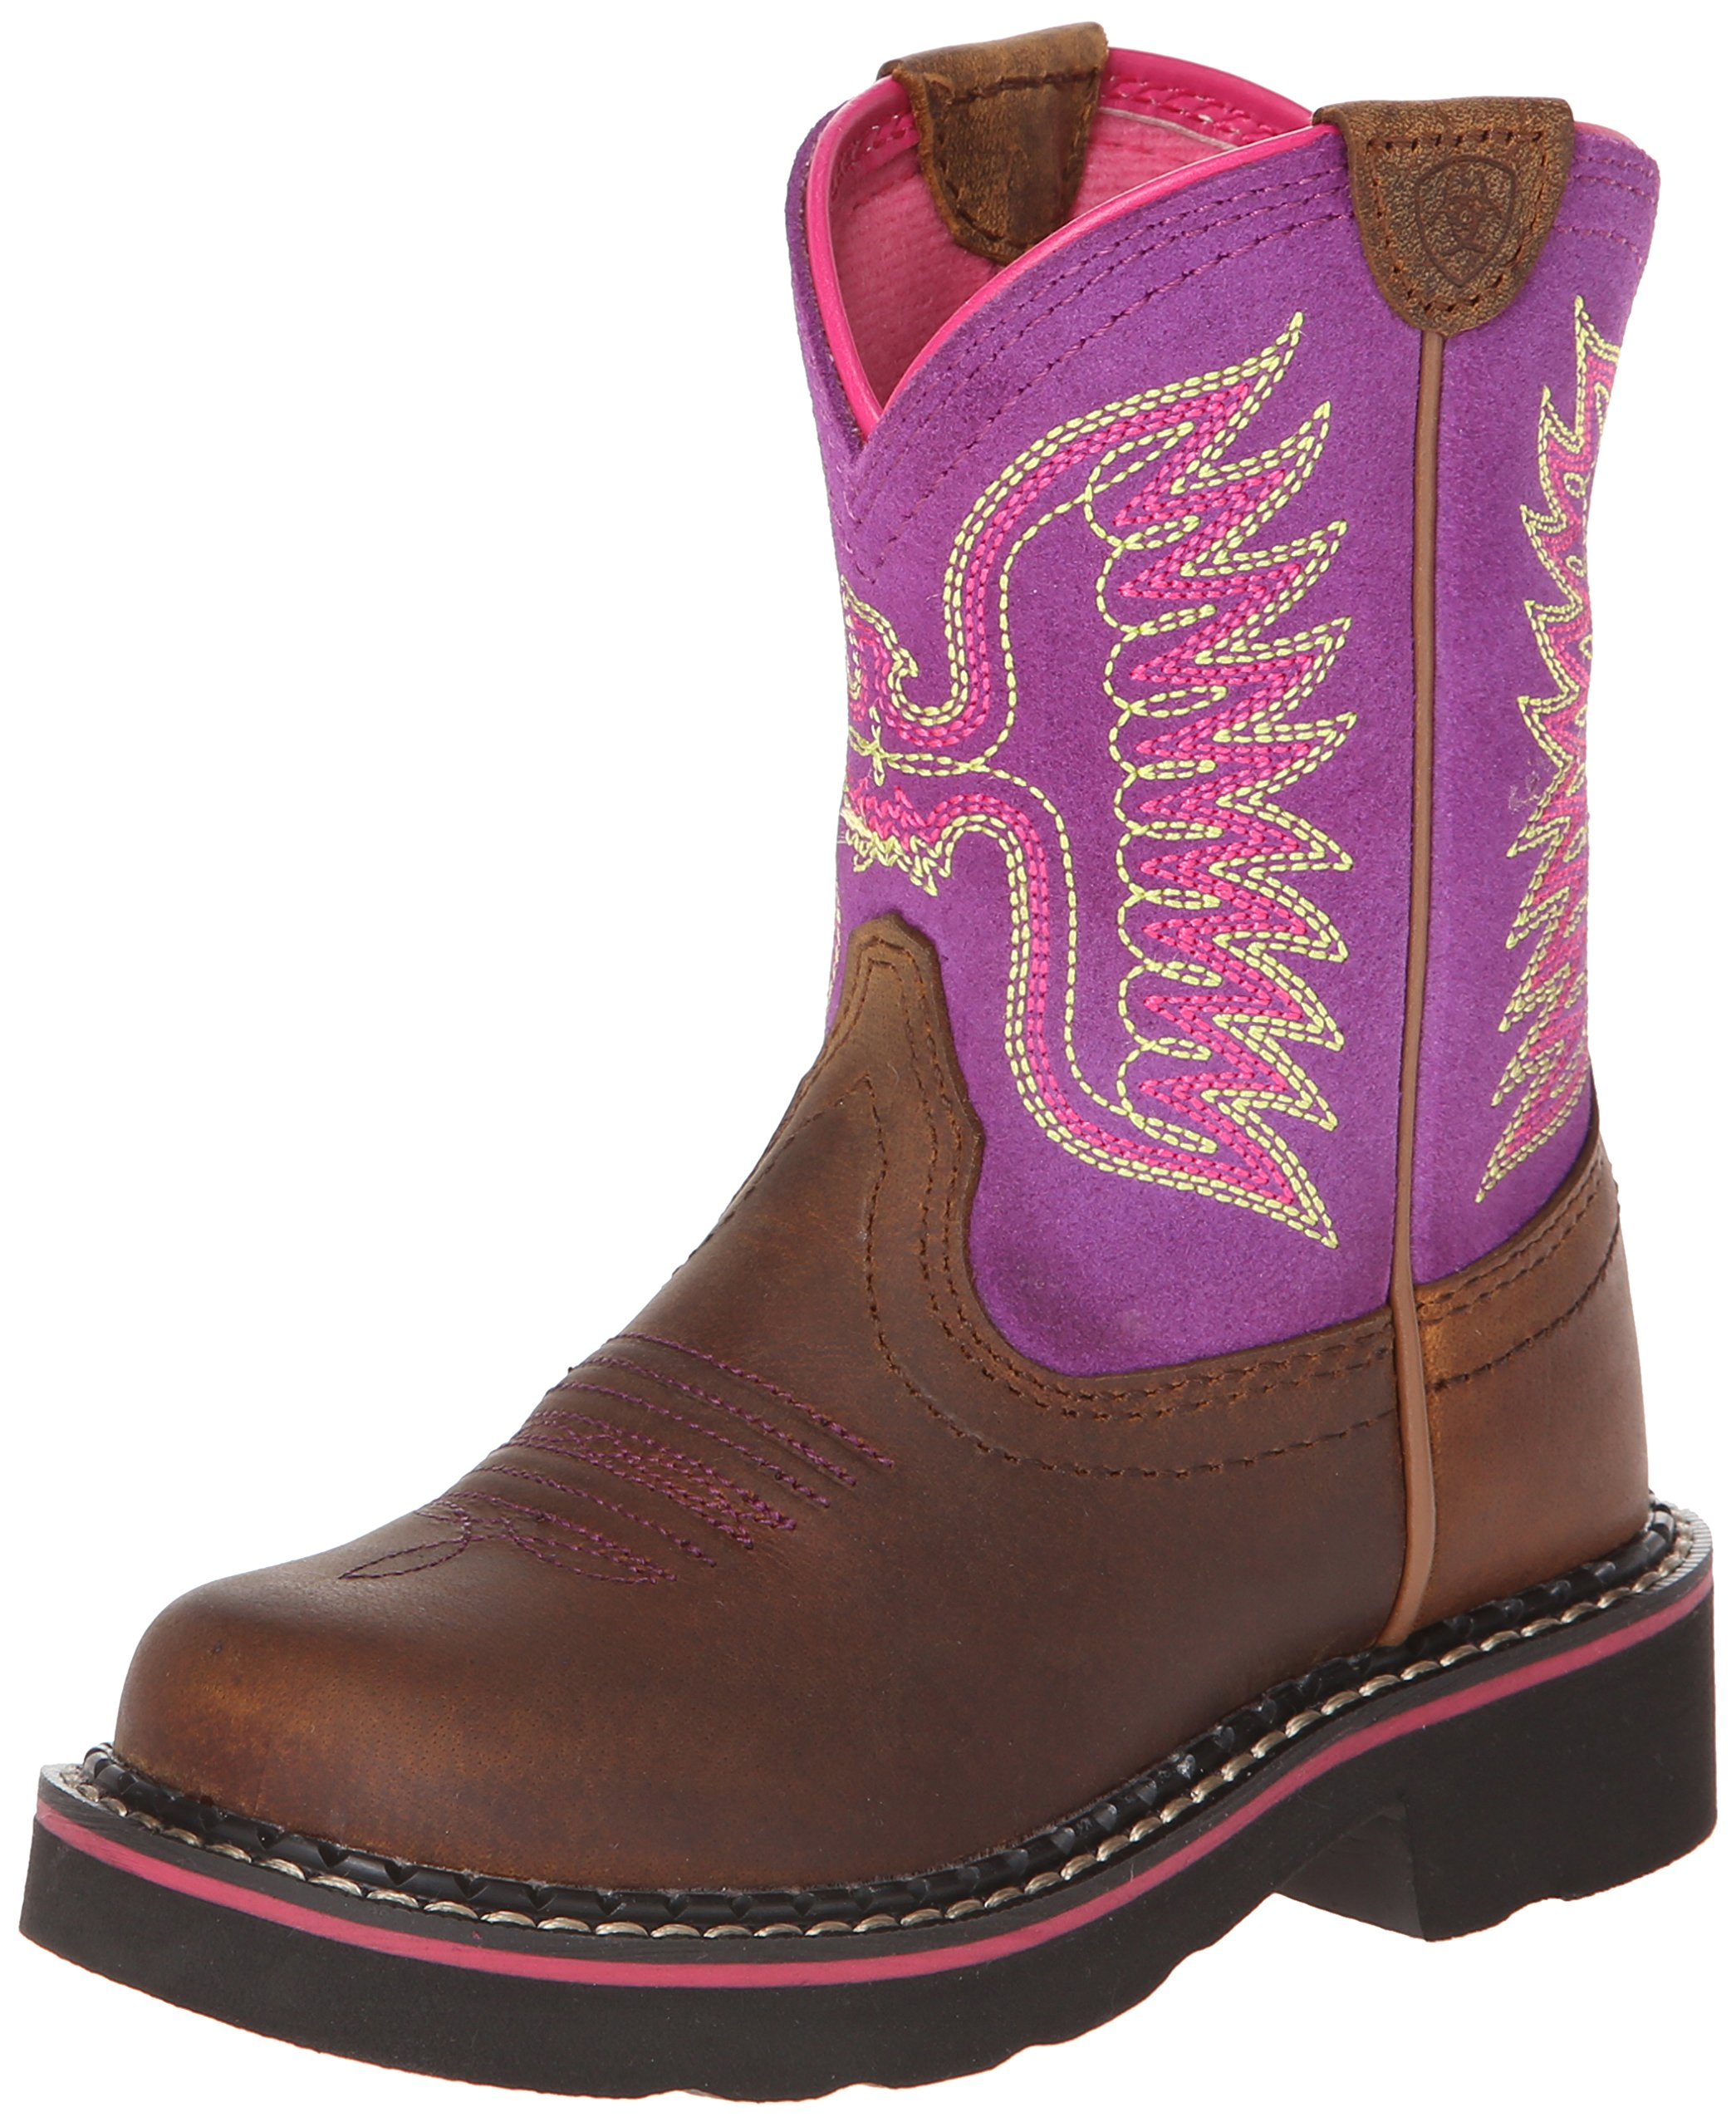 Kids' Fatbaby Thunderbird Western Cowboy Boot, Powder Brown/Amethyst, 12.5 M US Little Kid by ARIAT (Image #1)